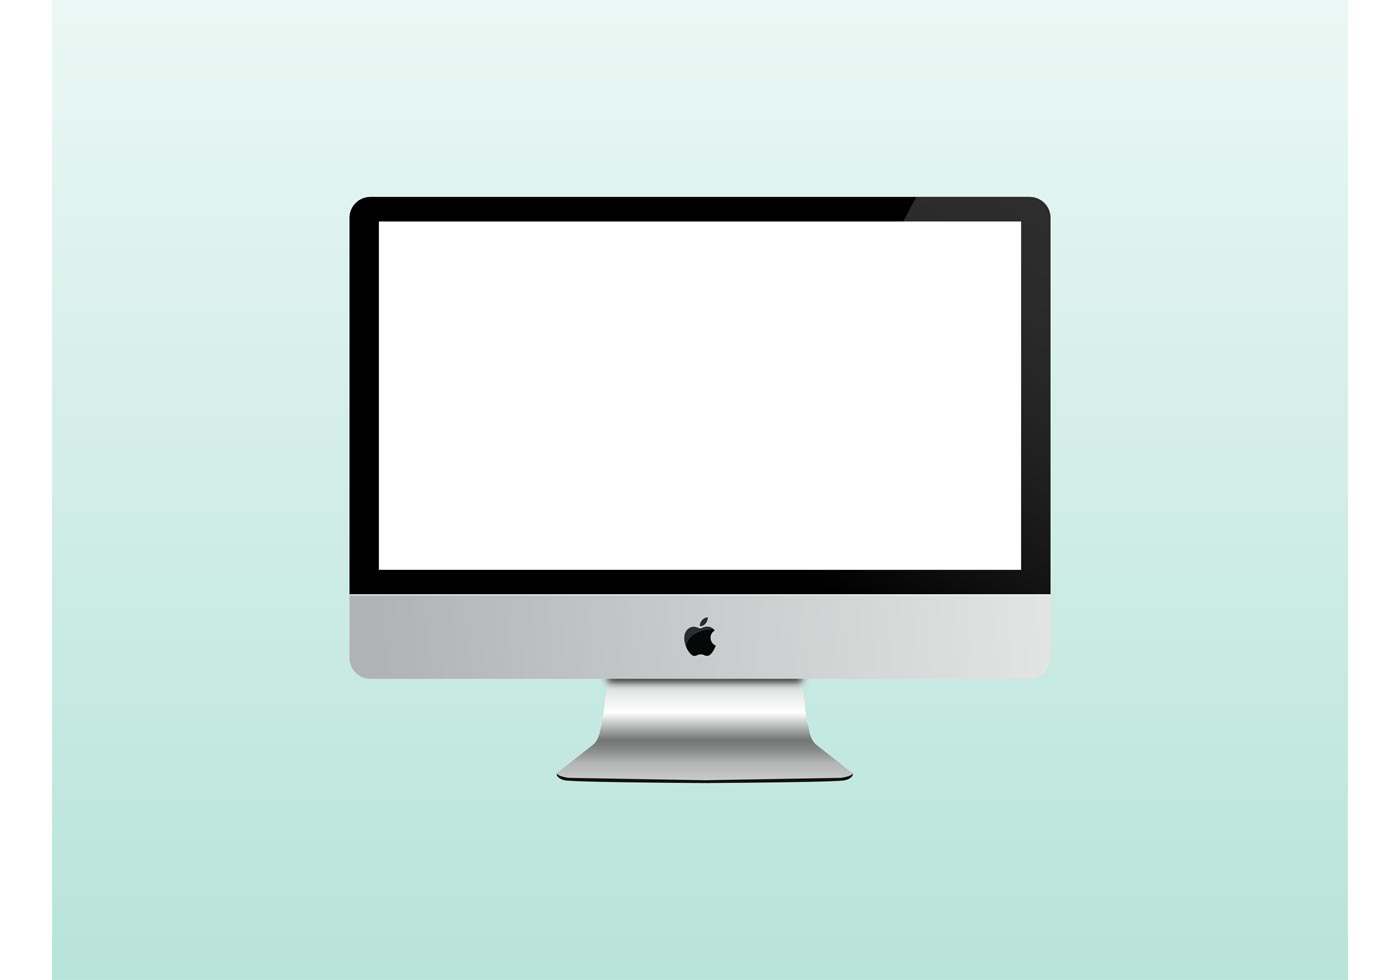 Imac Mac Apple Computer Free Vector Art.